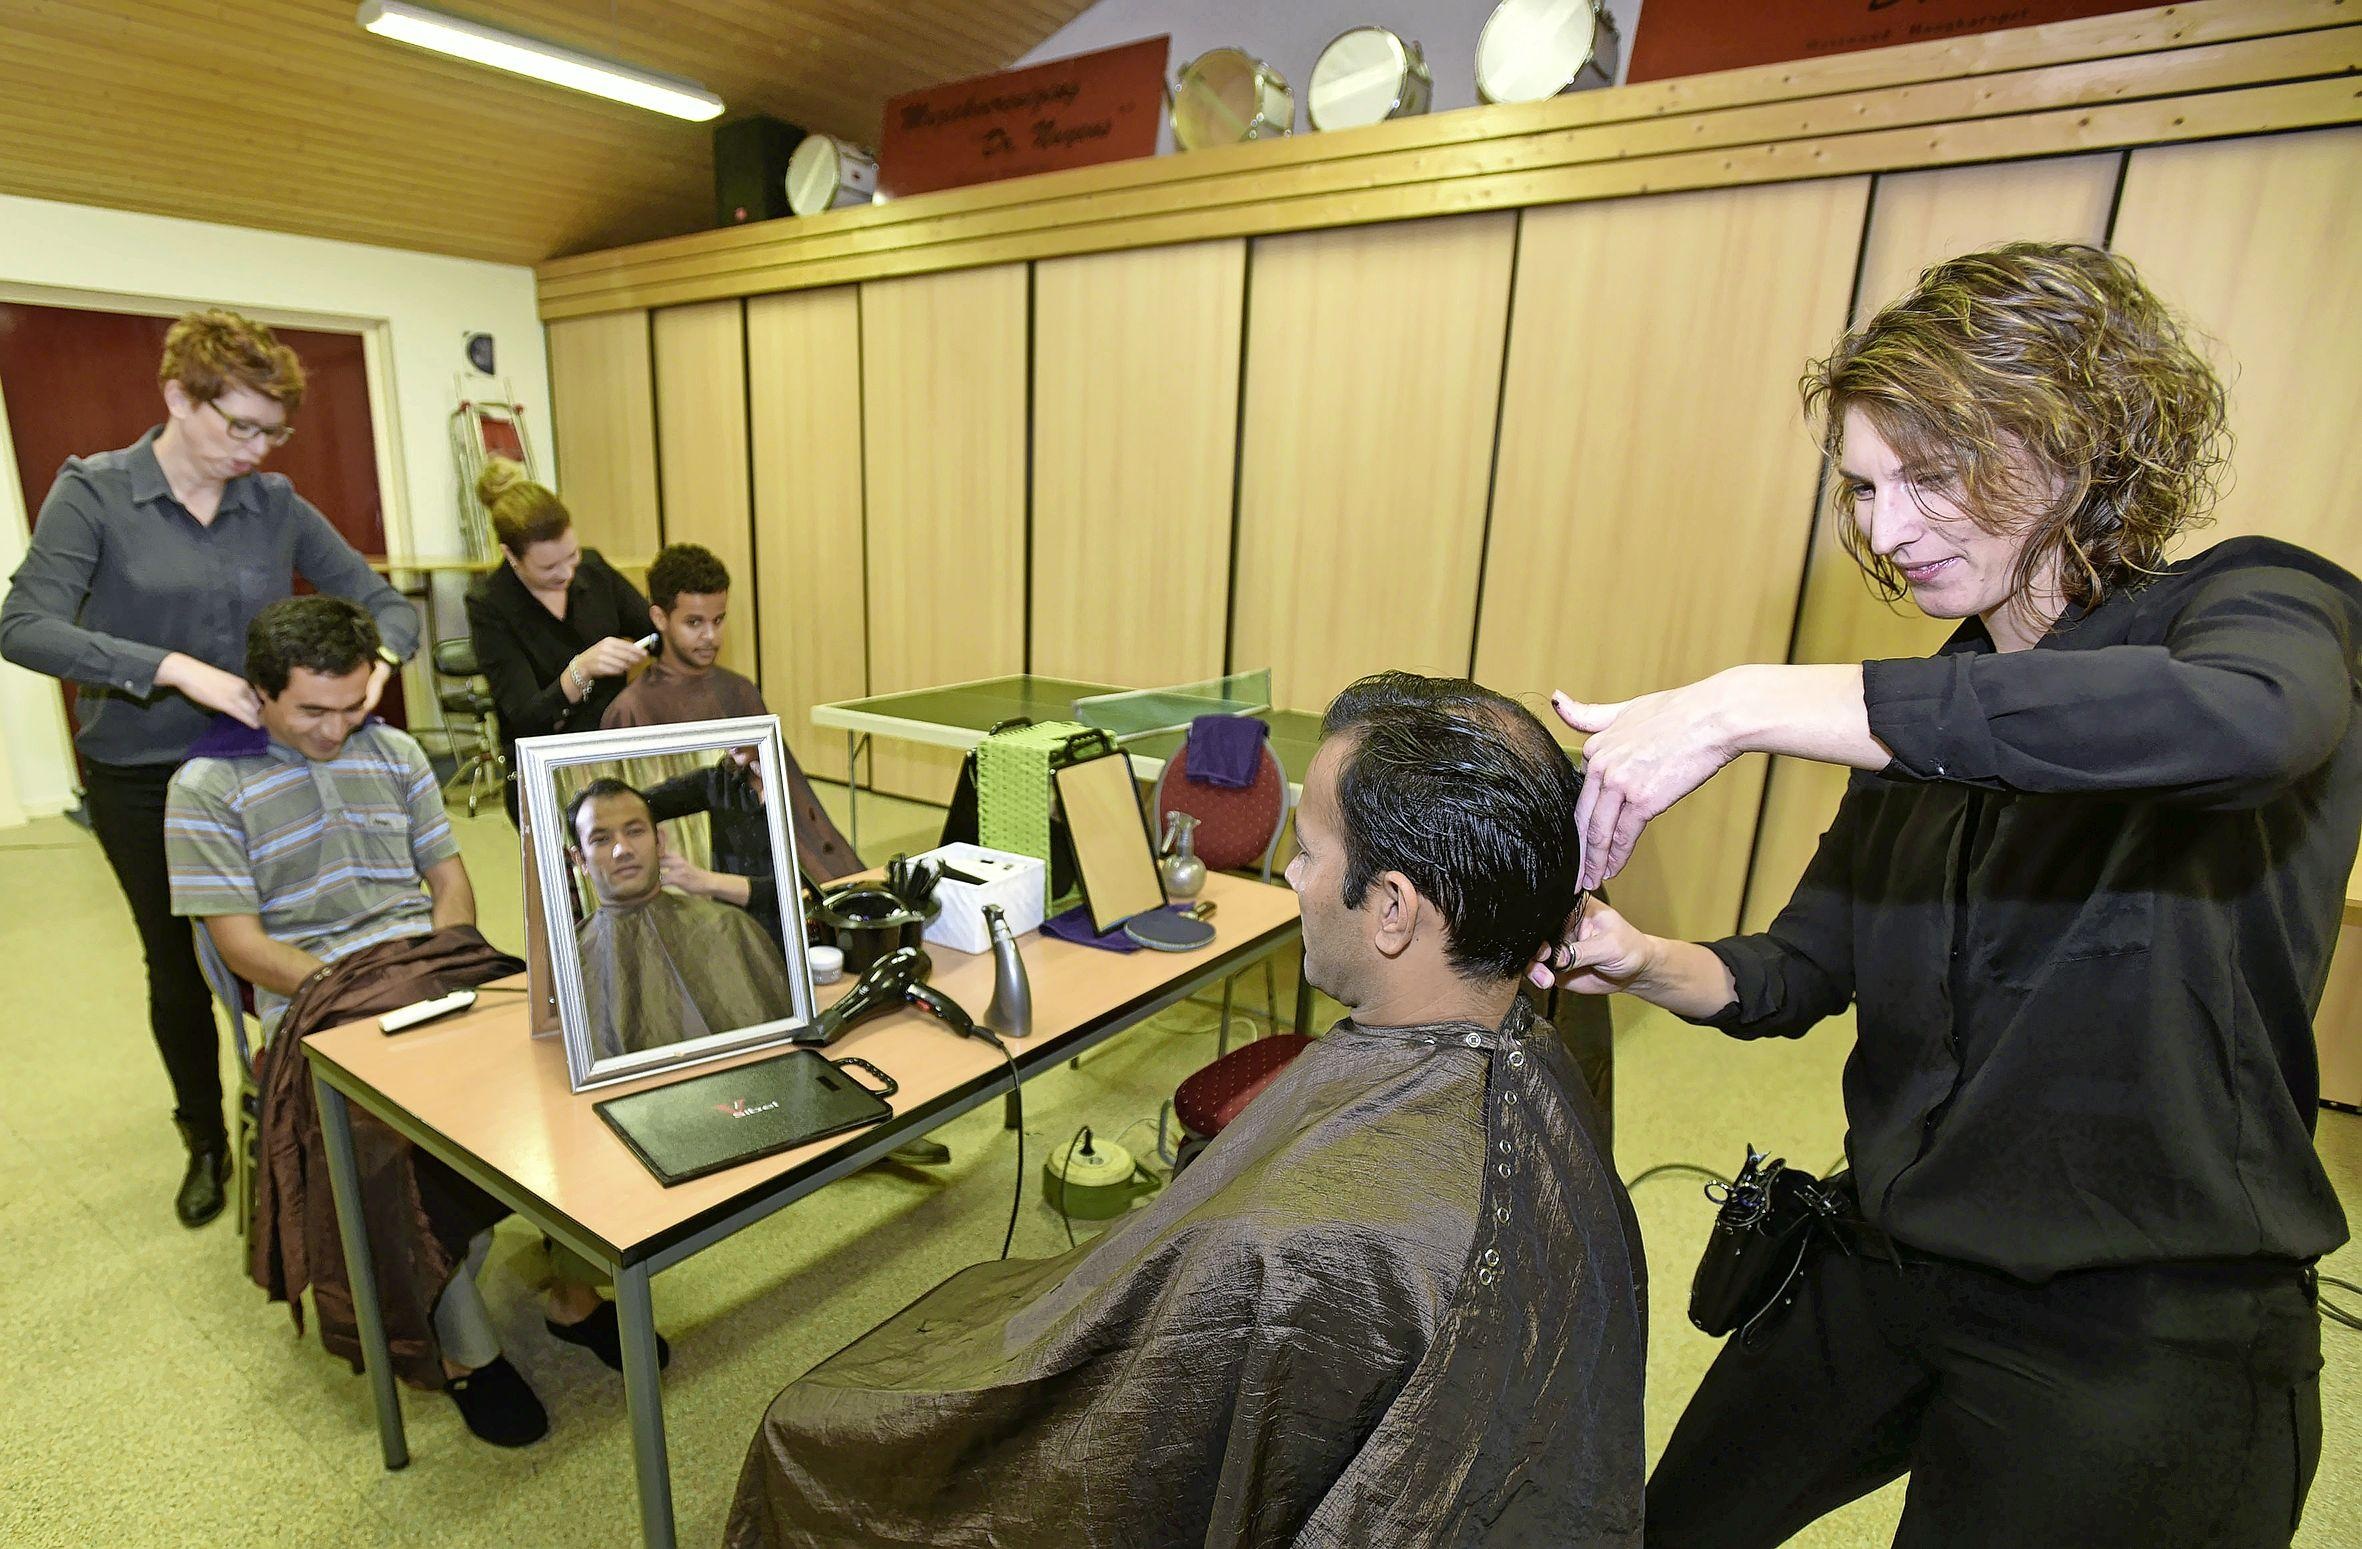 West-Friesland vreest nieuwe achterstanden huisvesten vergunninghouders. Woningmarkt in regio nog verder onder druk